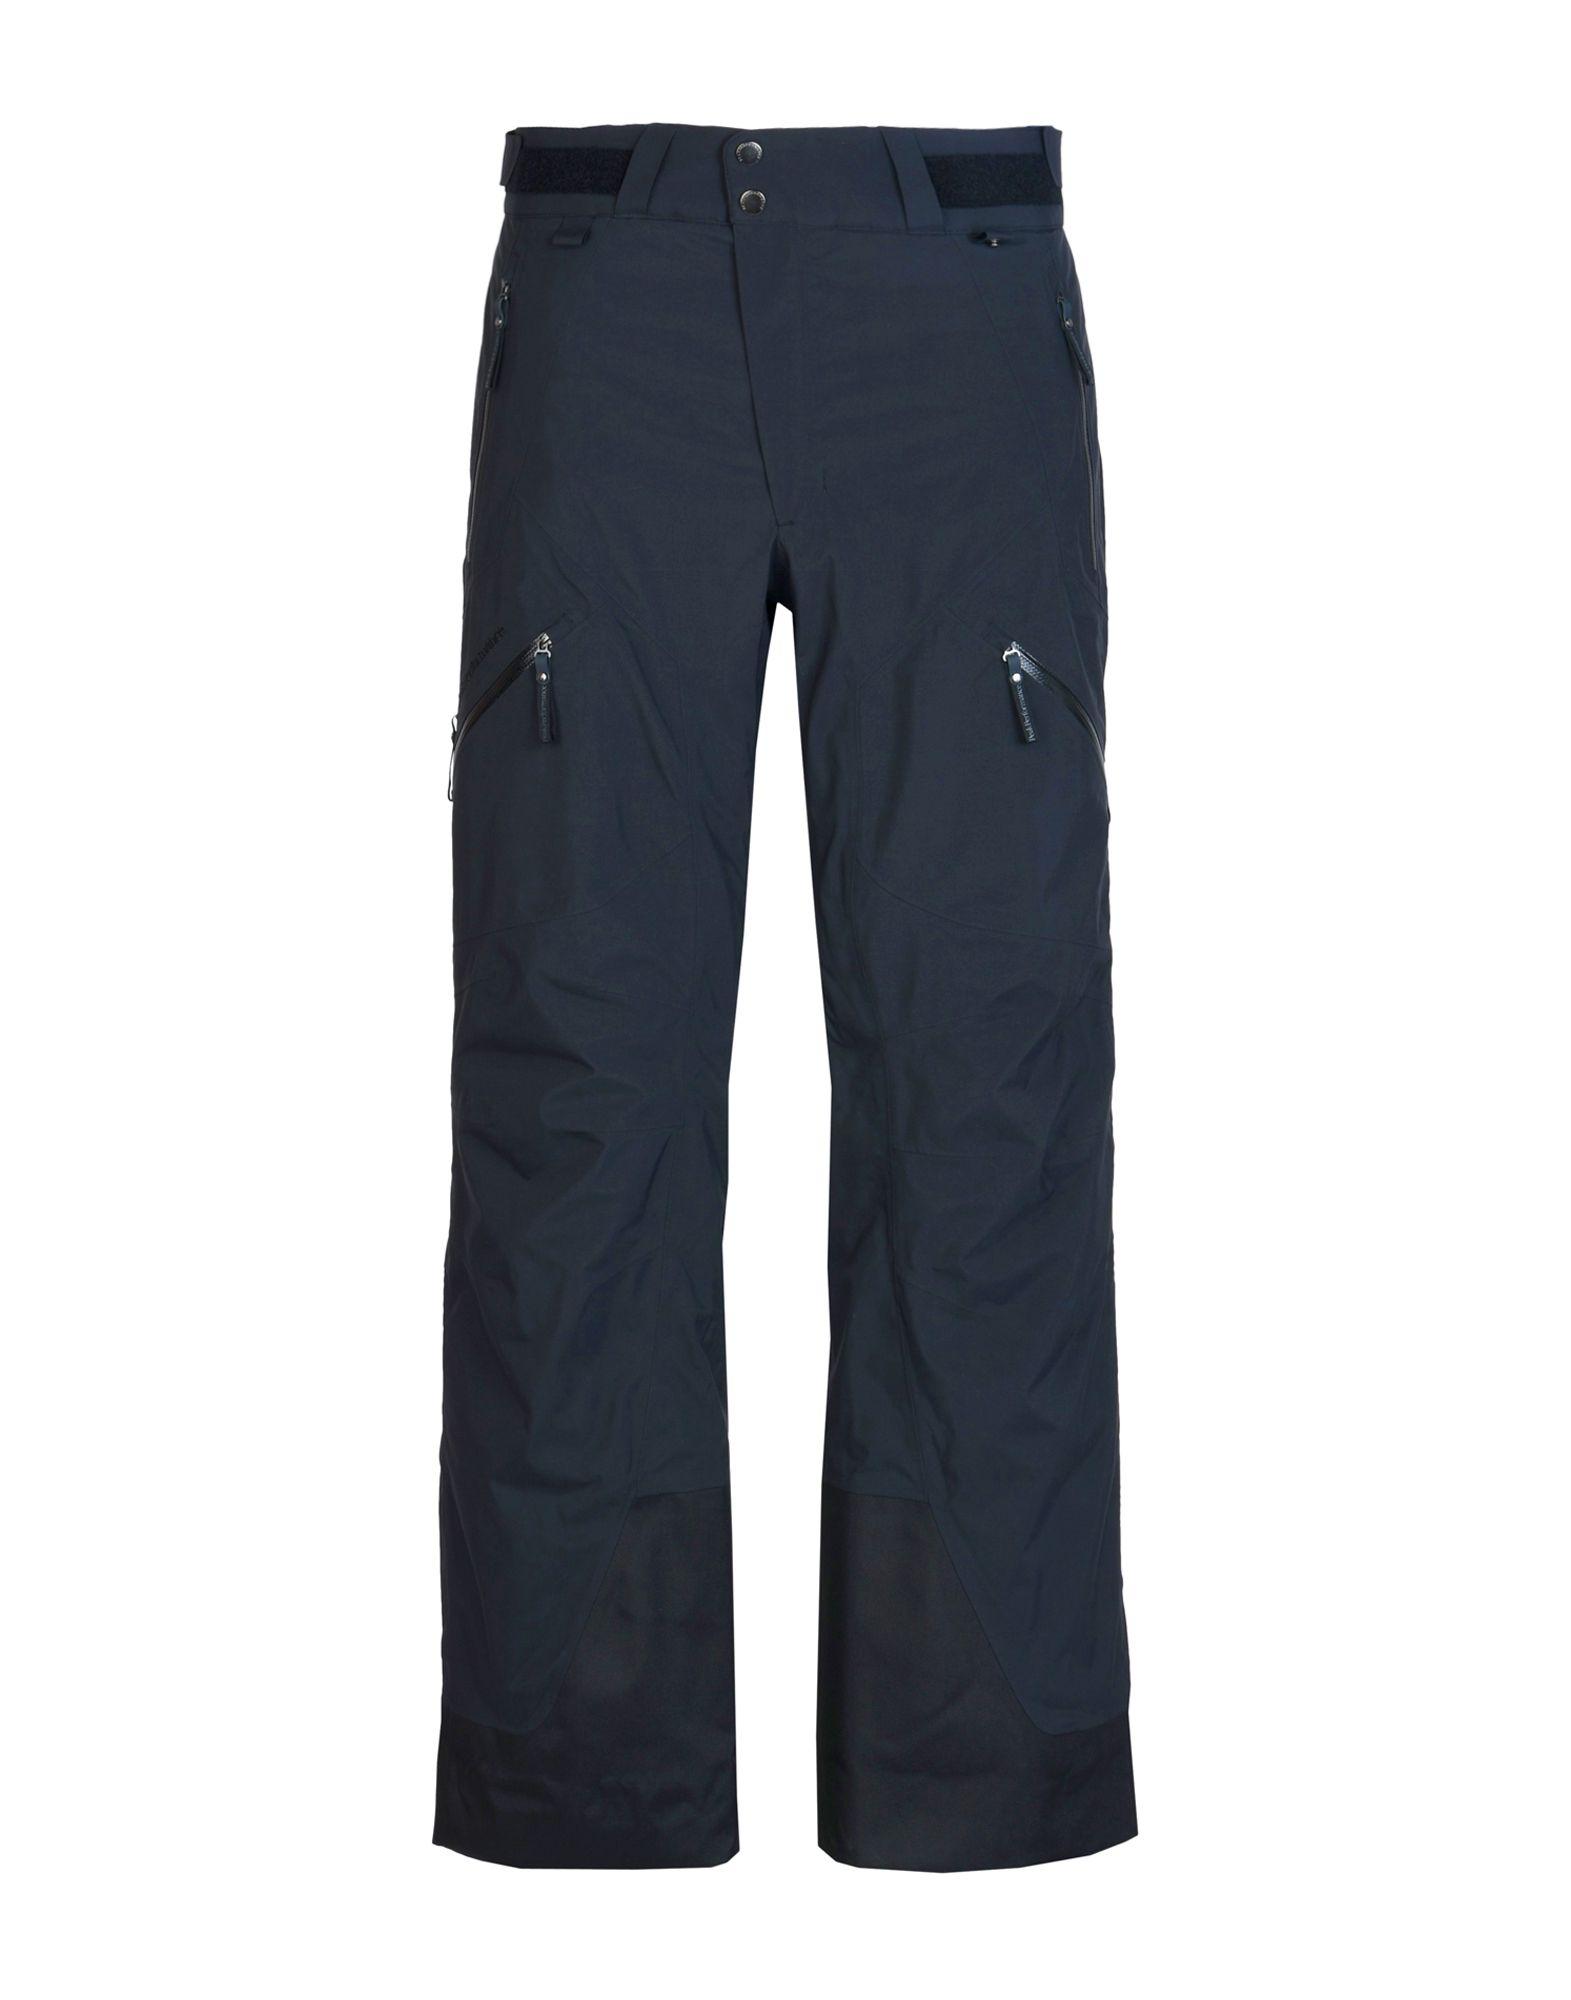 Pantaloni Sci Peak Performance Hel2lgravp - herren - 36949038WJ